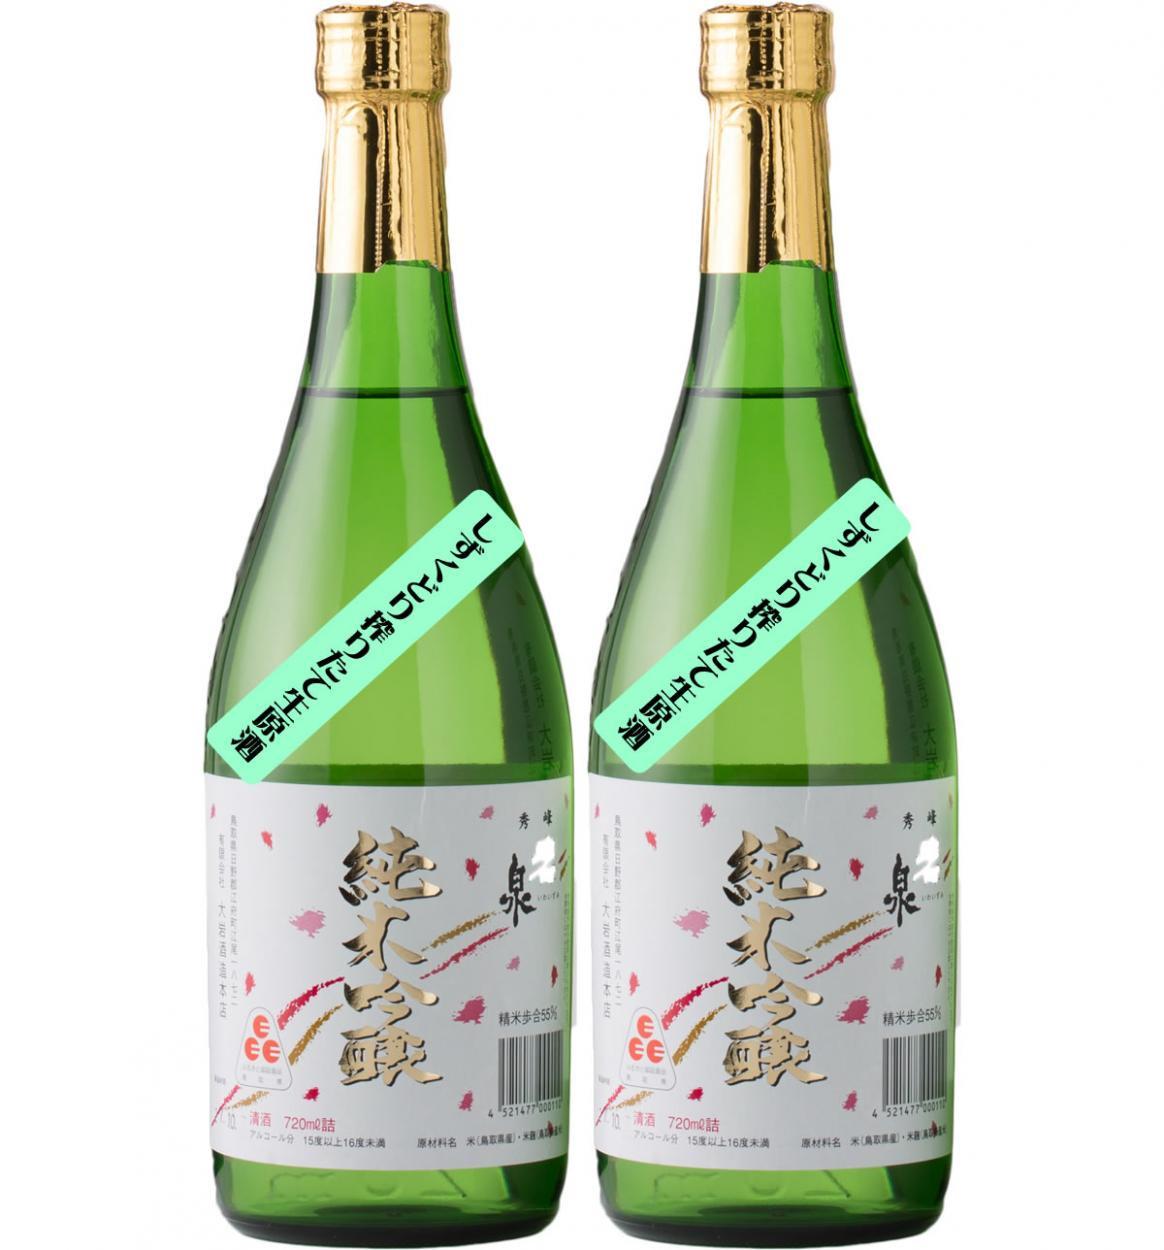 <img class='new_mark_img1' src='https://img.shop-pro.jp/img/new/icons7.gif' style='border:none;display:inline;margin:0px;padding:0px;width:auto;' />【頒布会】最高級吟醸酒 4100円×5回(送料込)